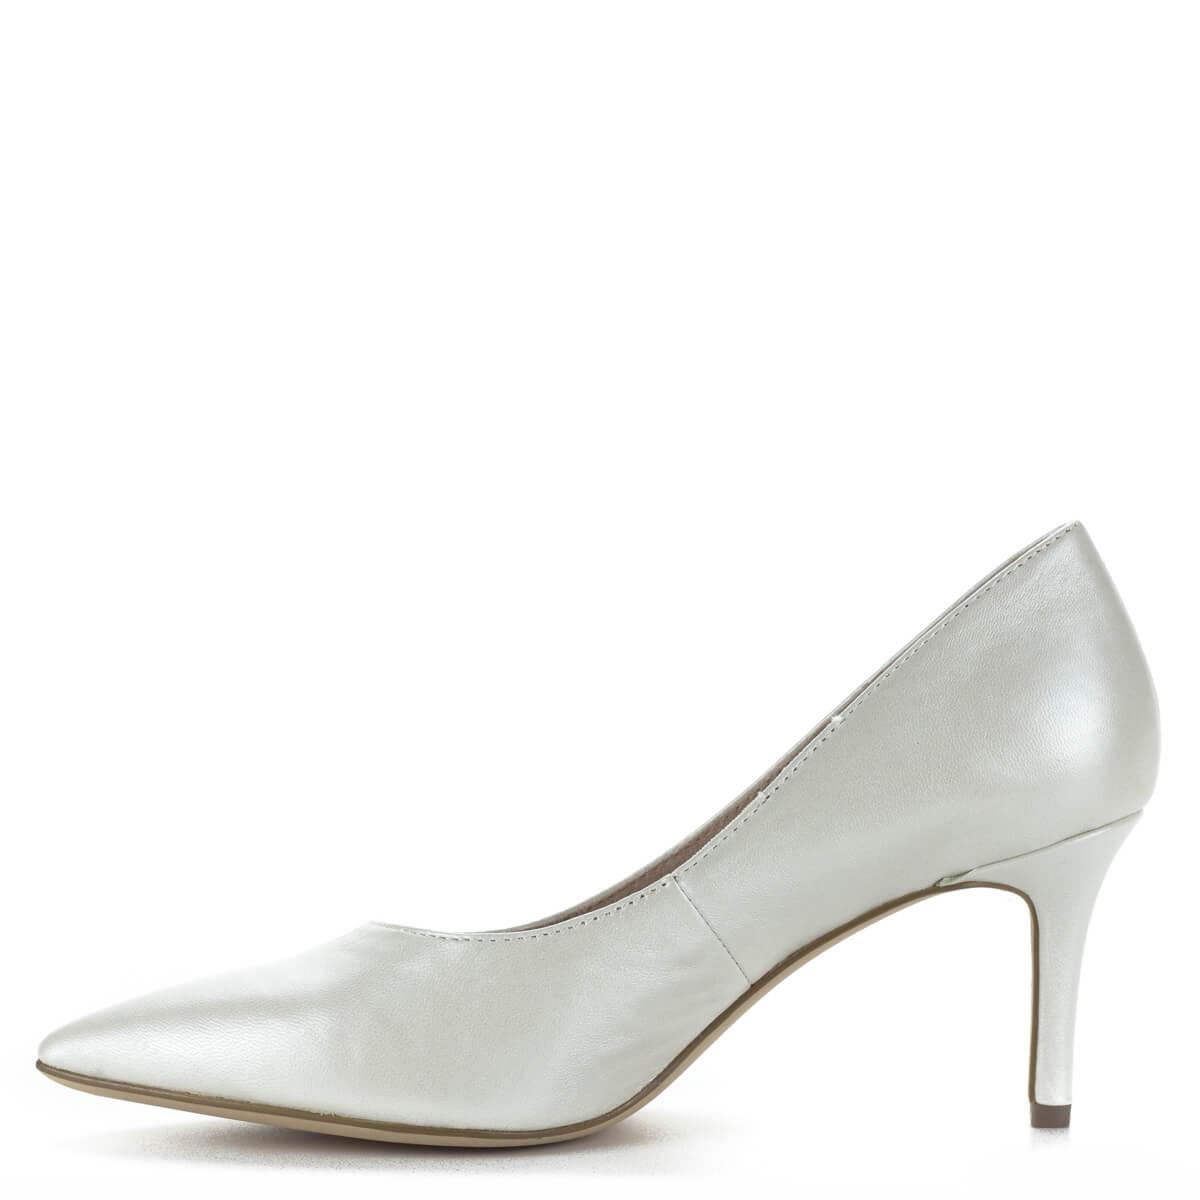 ... Fehér Tamaris magassarkú cipő 7 centis sarokkal fa8e56cab0